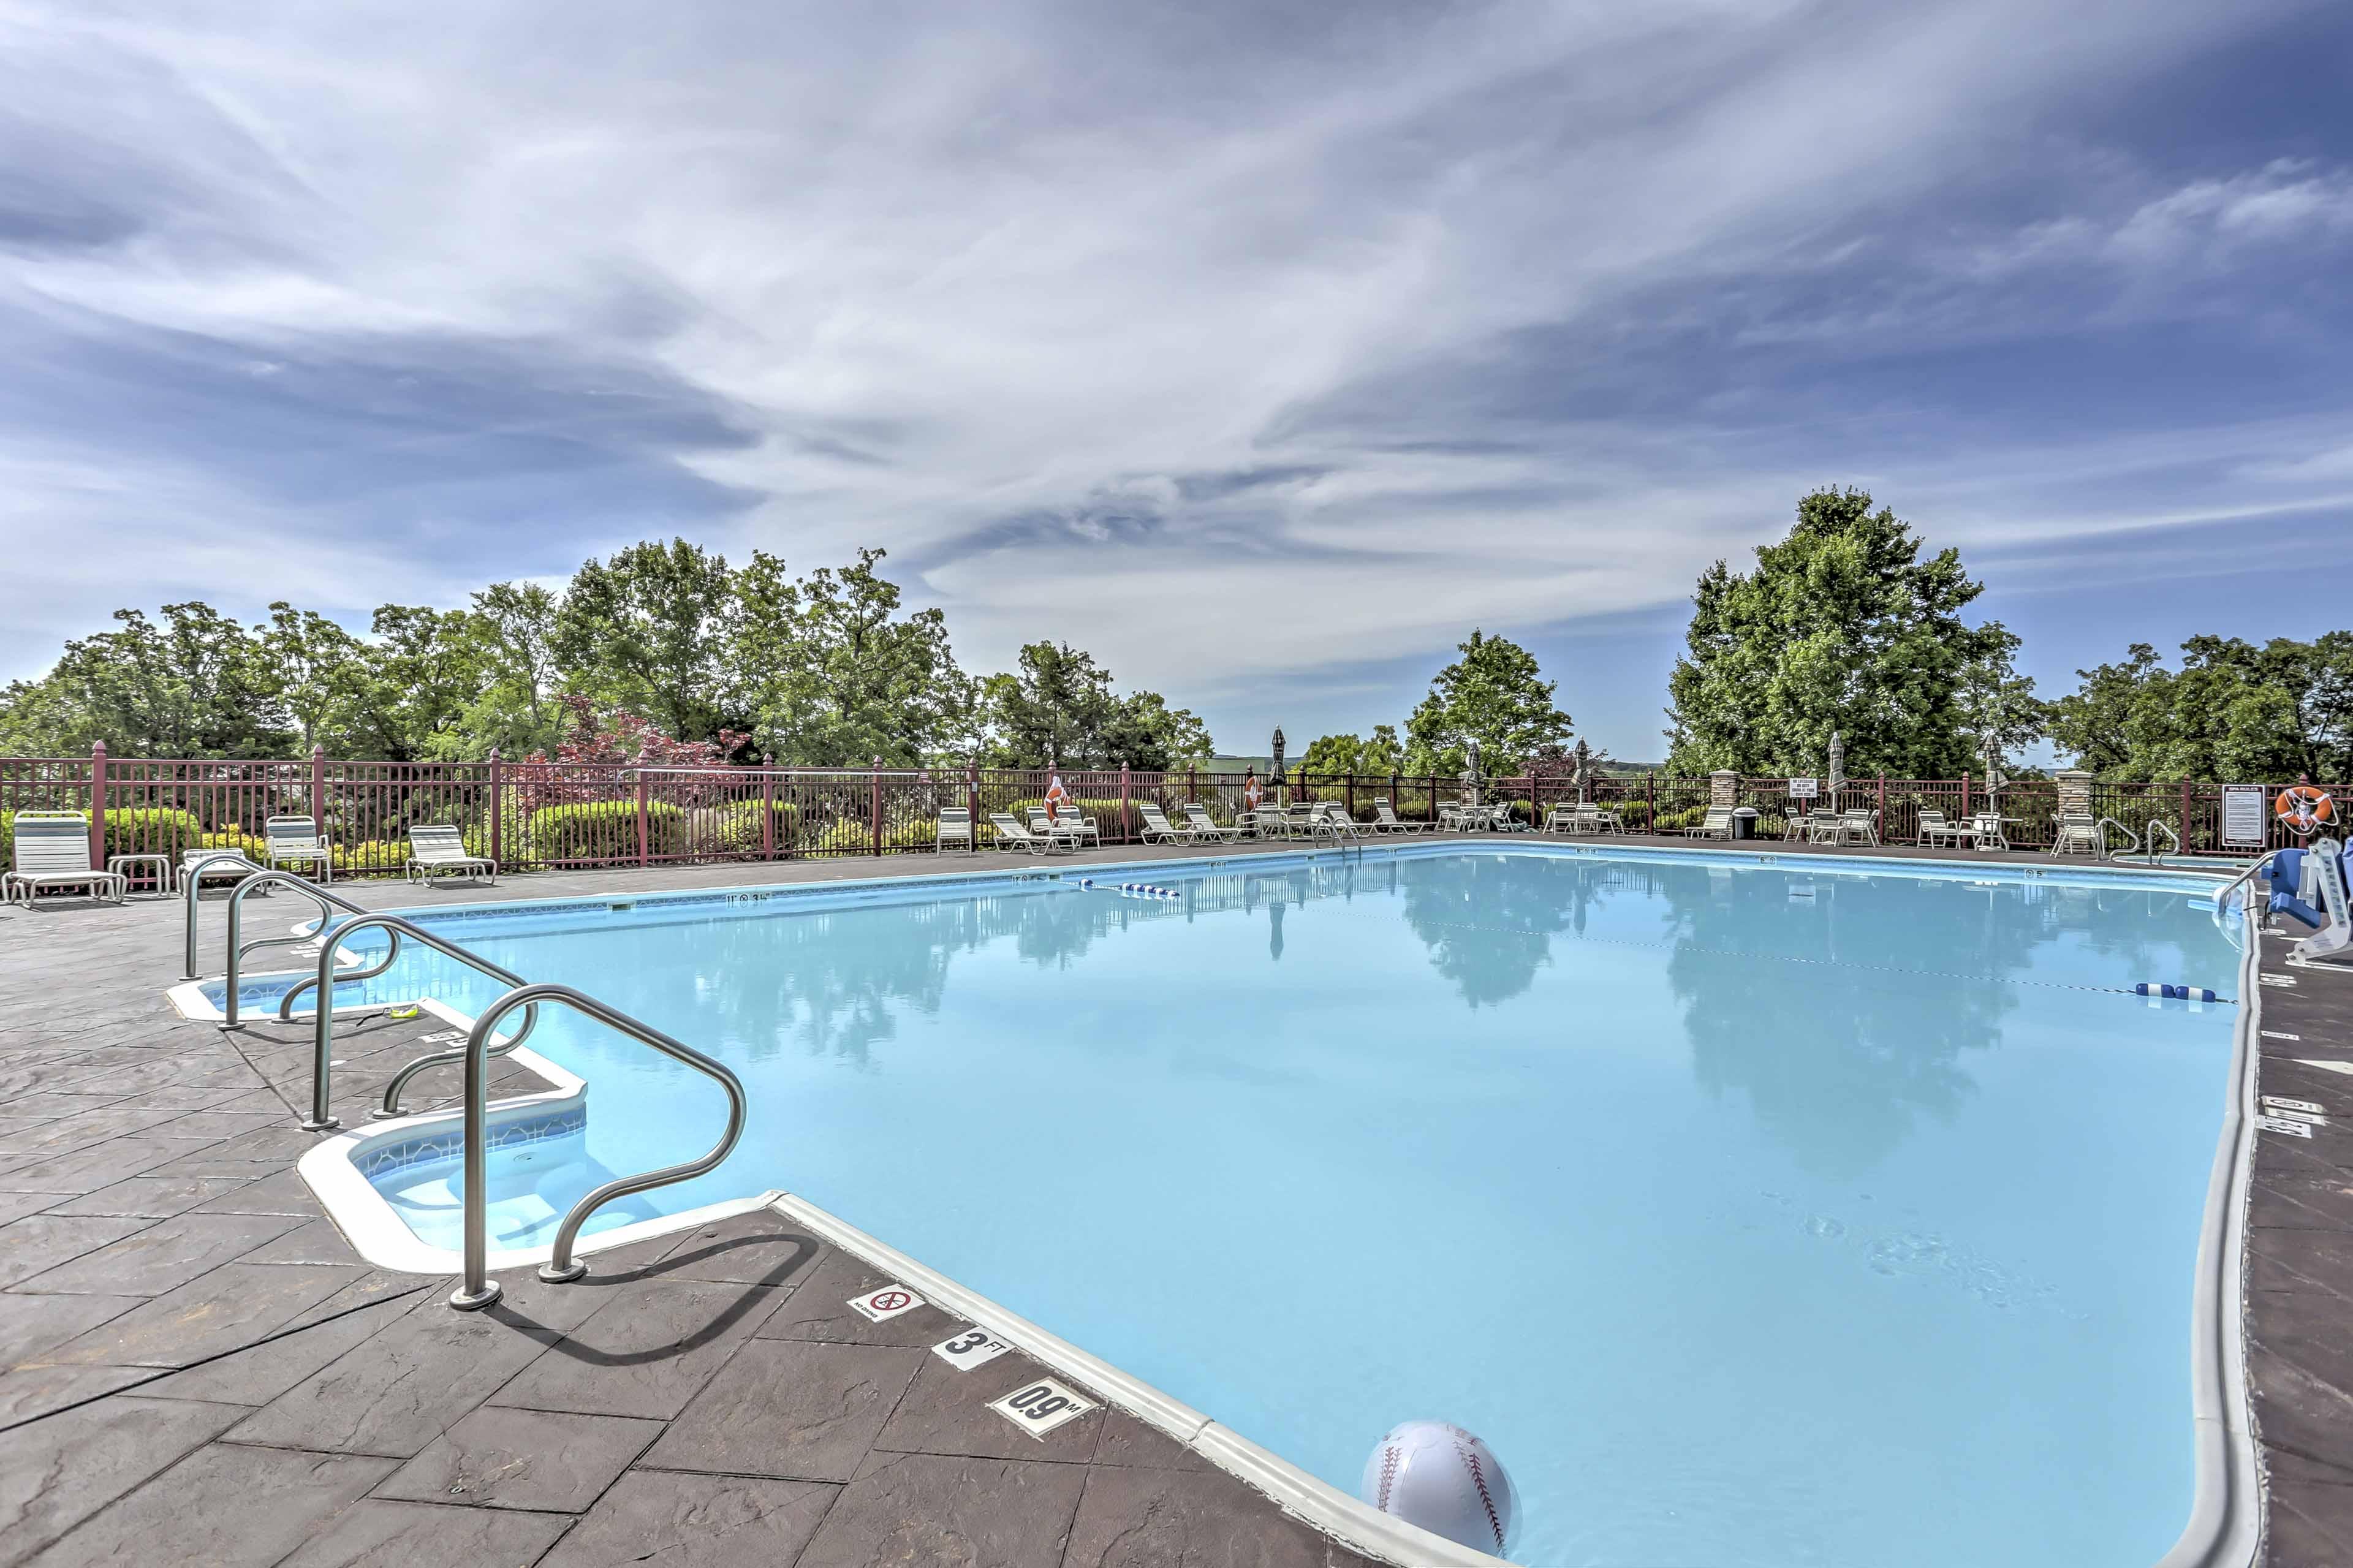 1 of 5 Community Pools | 450-Acre Resort